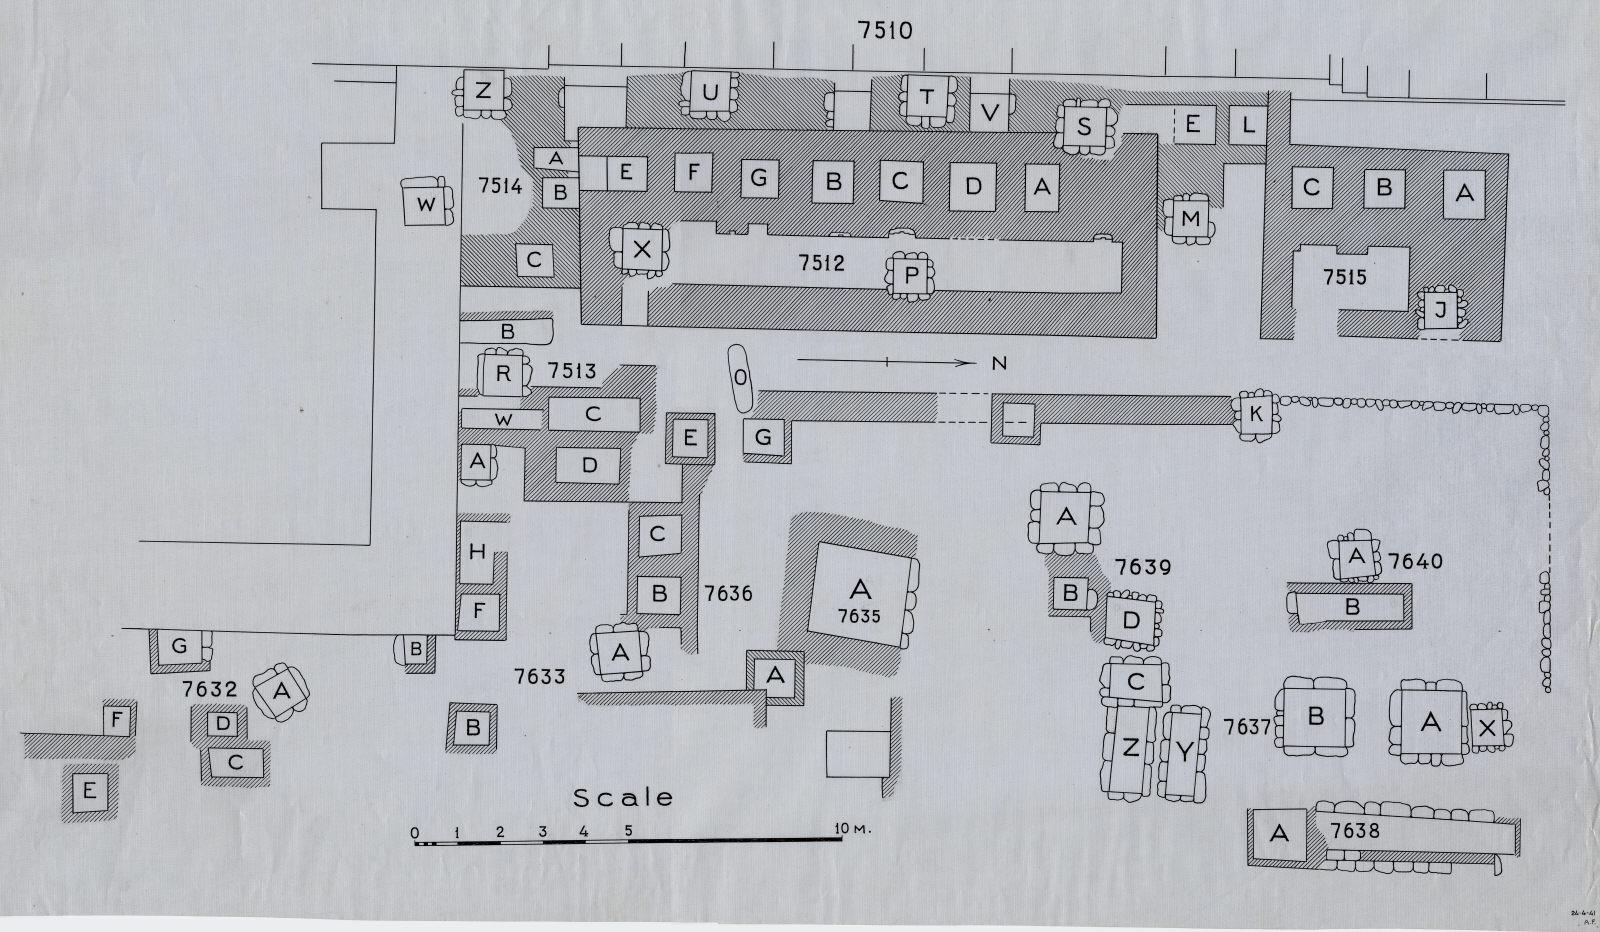 Maps and plans: Plan of Cemetery G 7000, NE corner